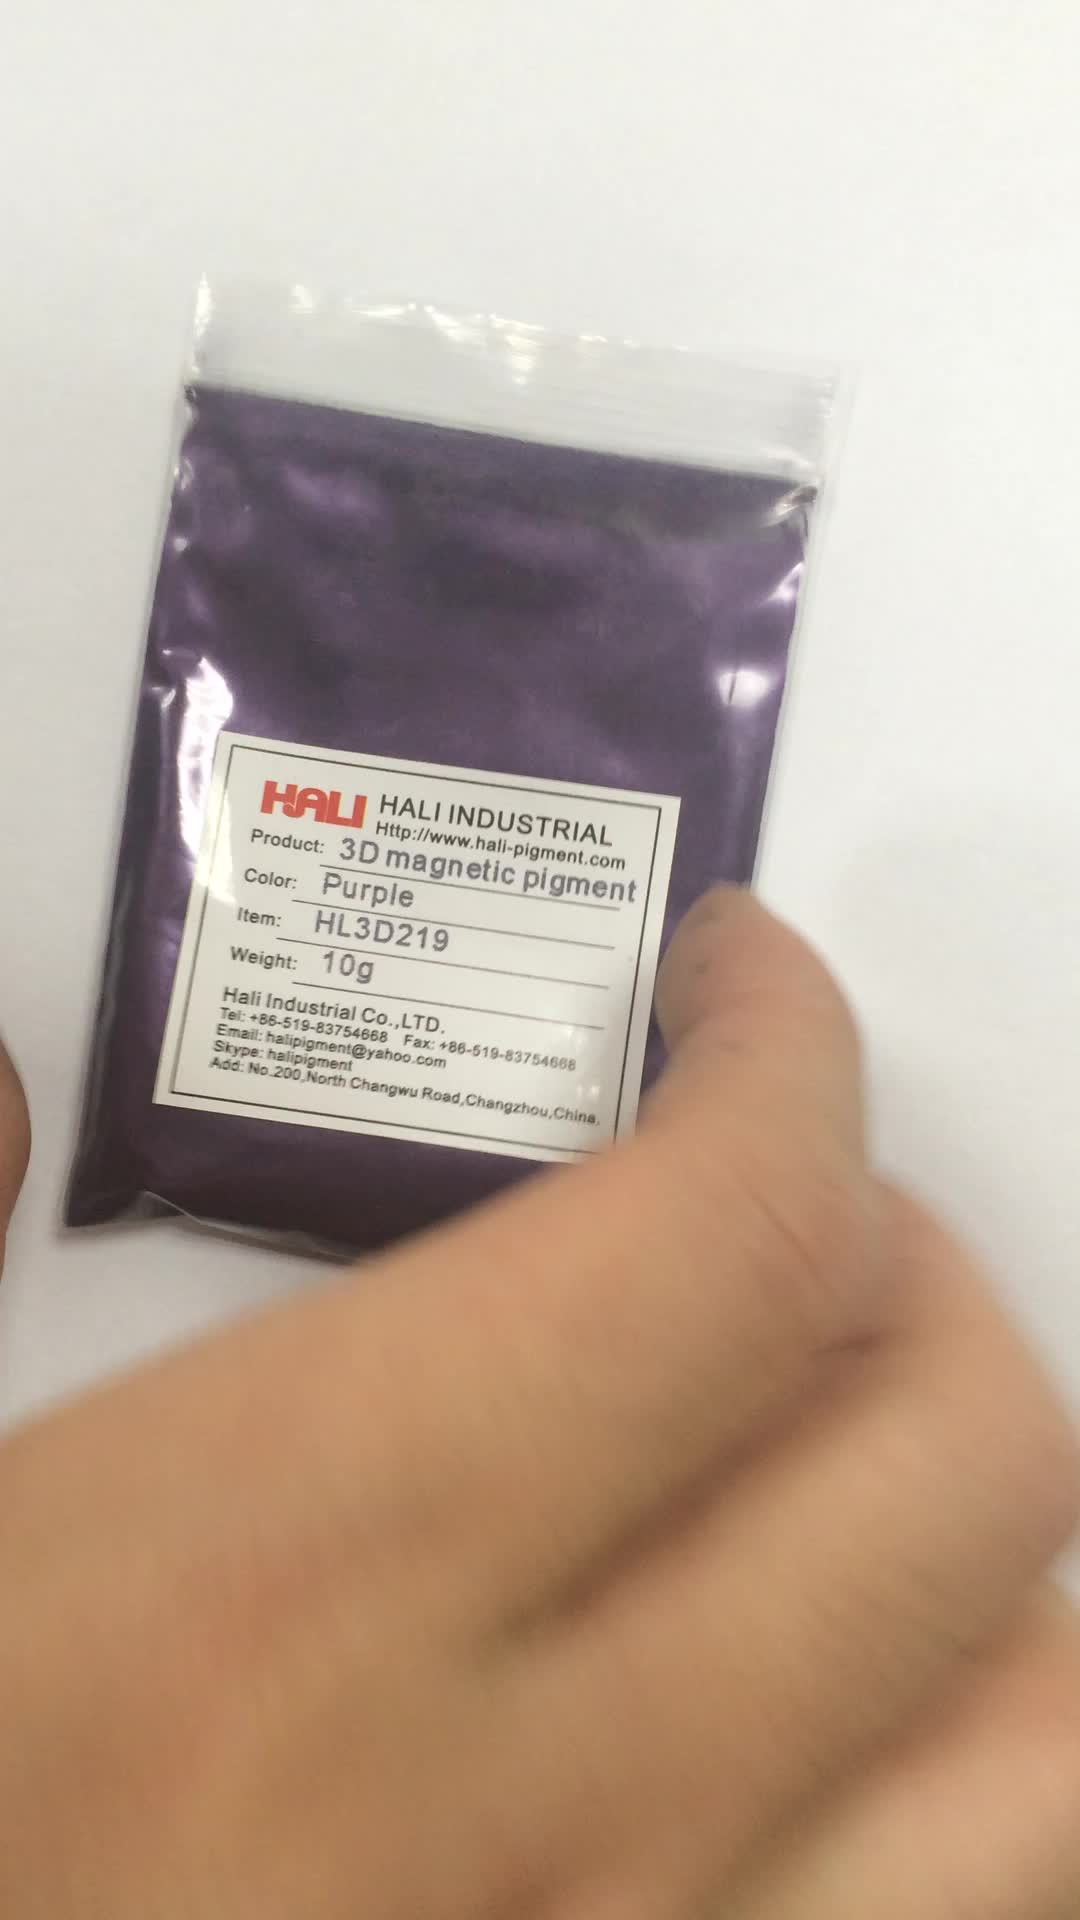 stereoscopic pigment,cat eye magnetic powder,3d effect,item:HL3D219,color:purple